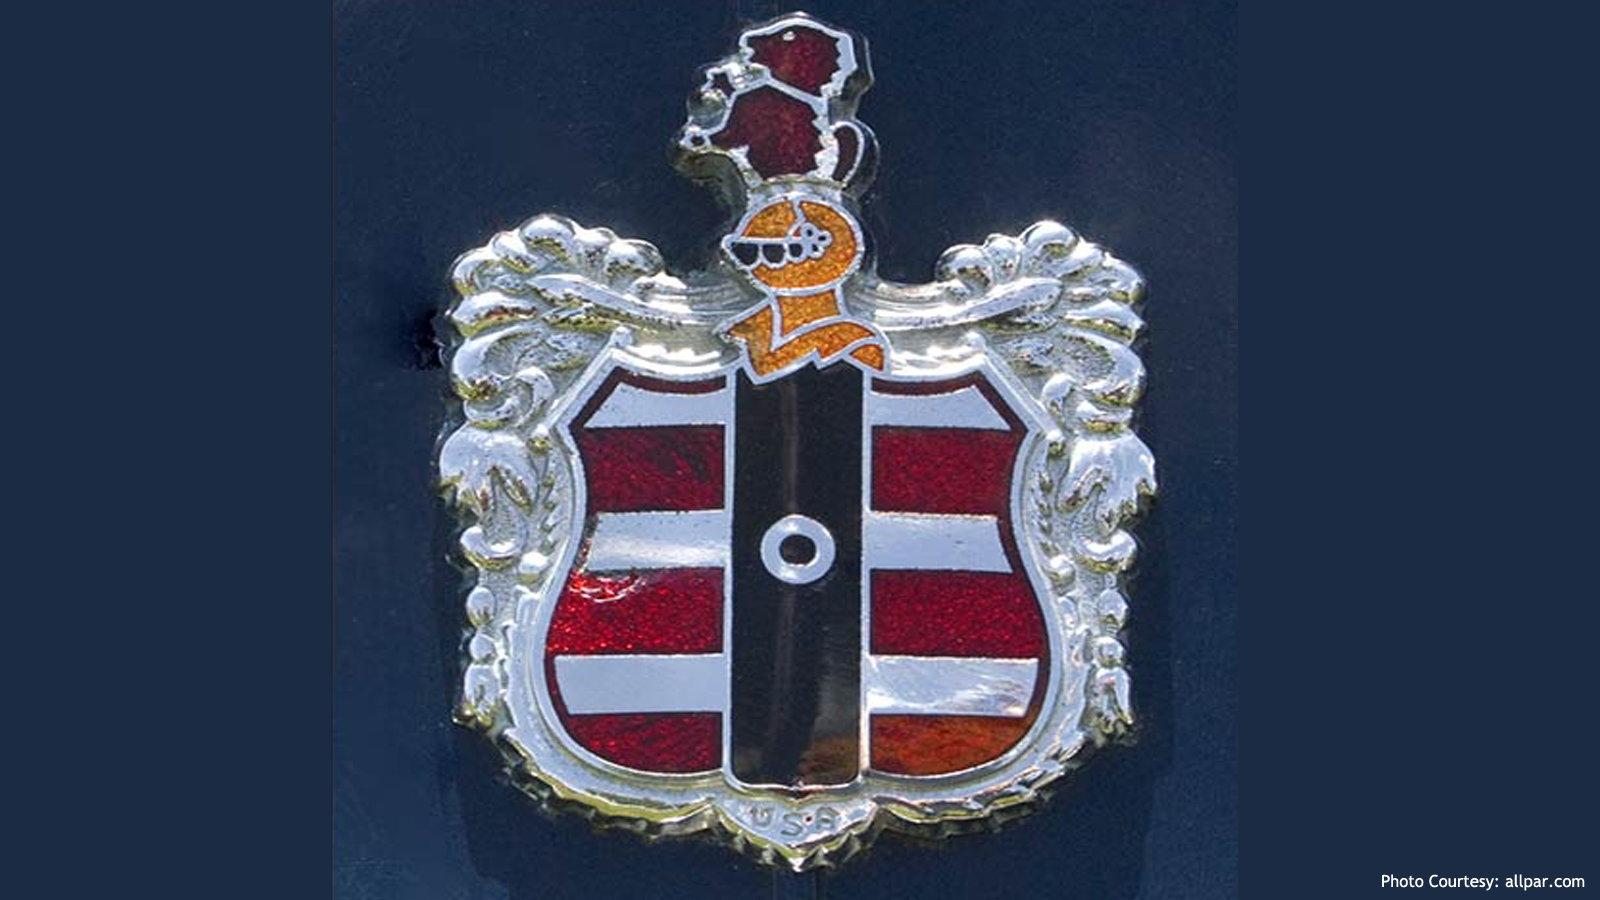 1951 Dodge Coronet Emblem